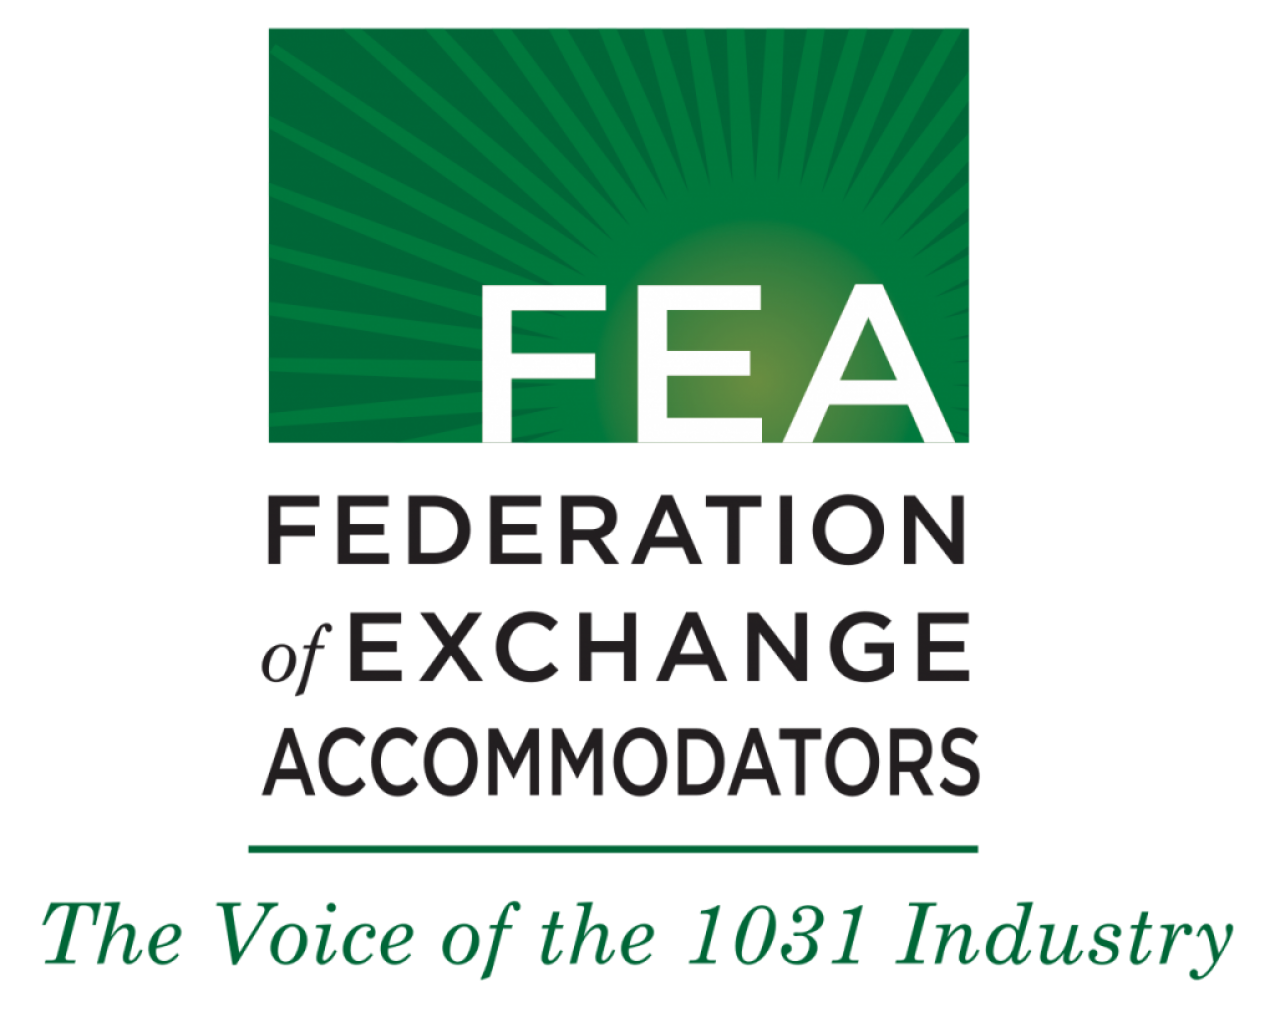 fea_logo-1024x813-1275x1012